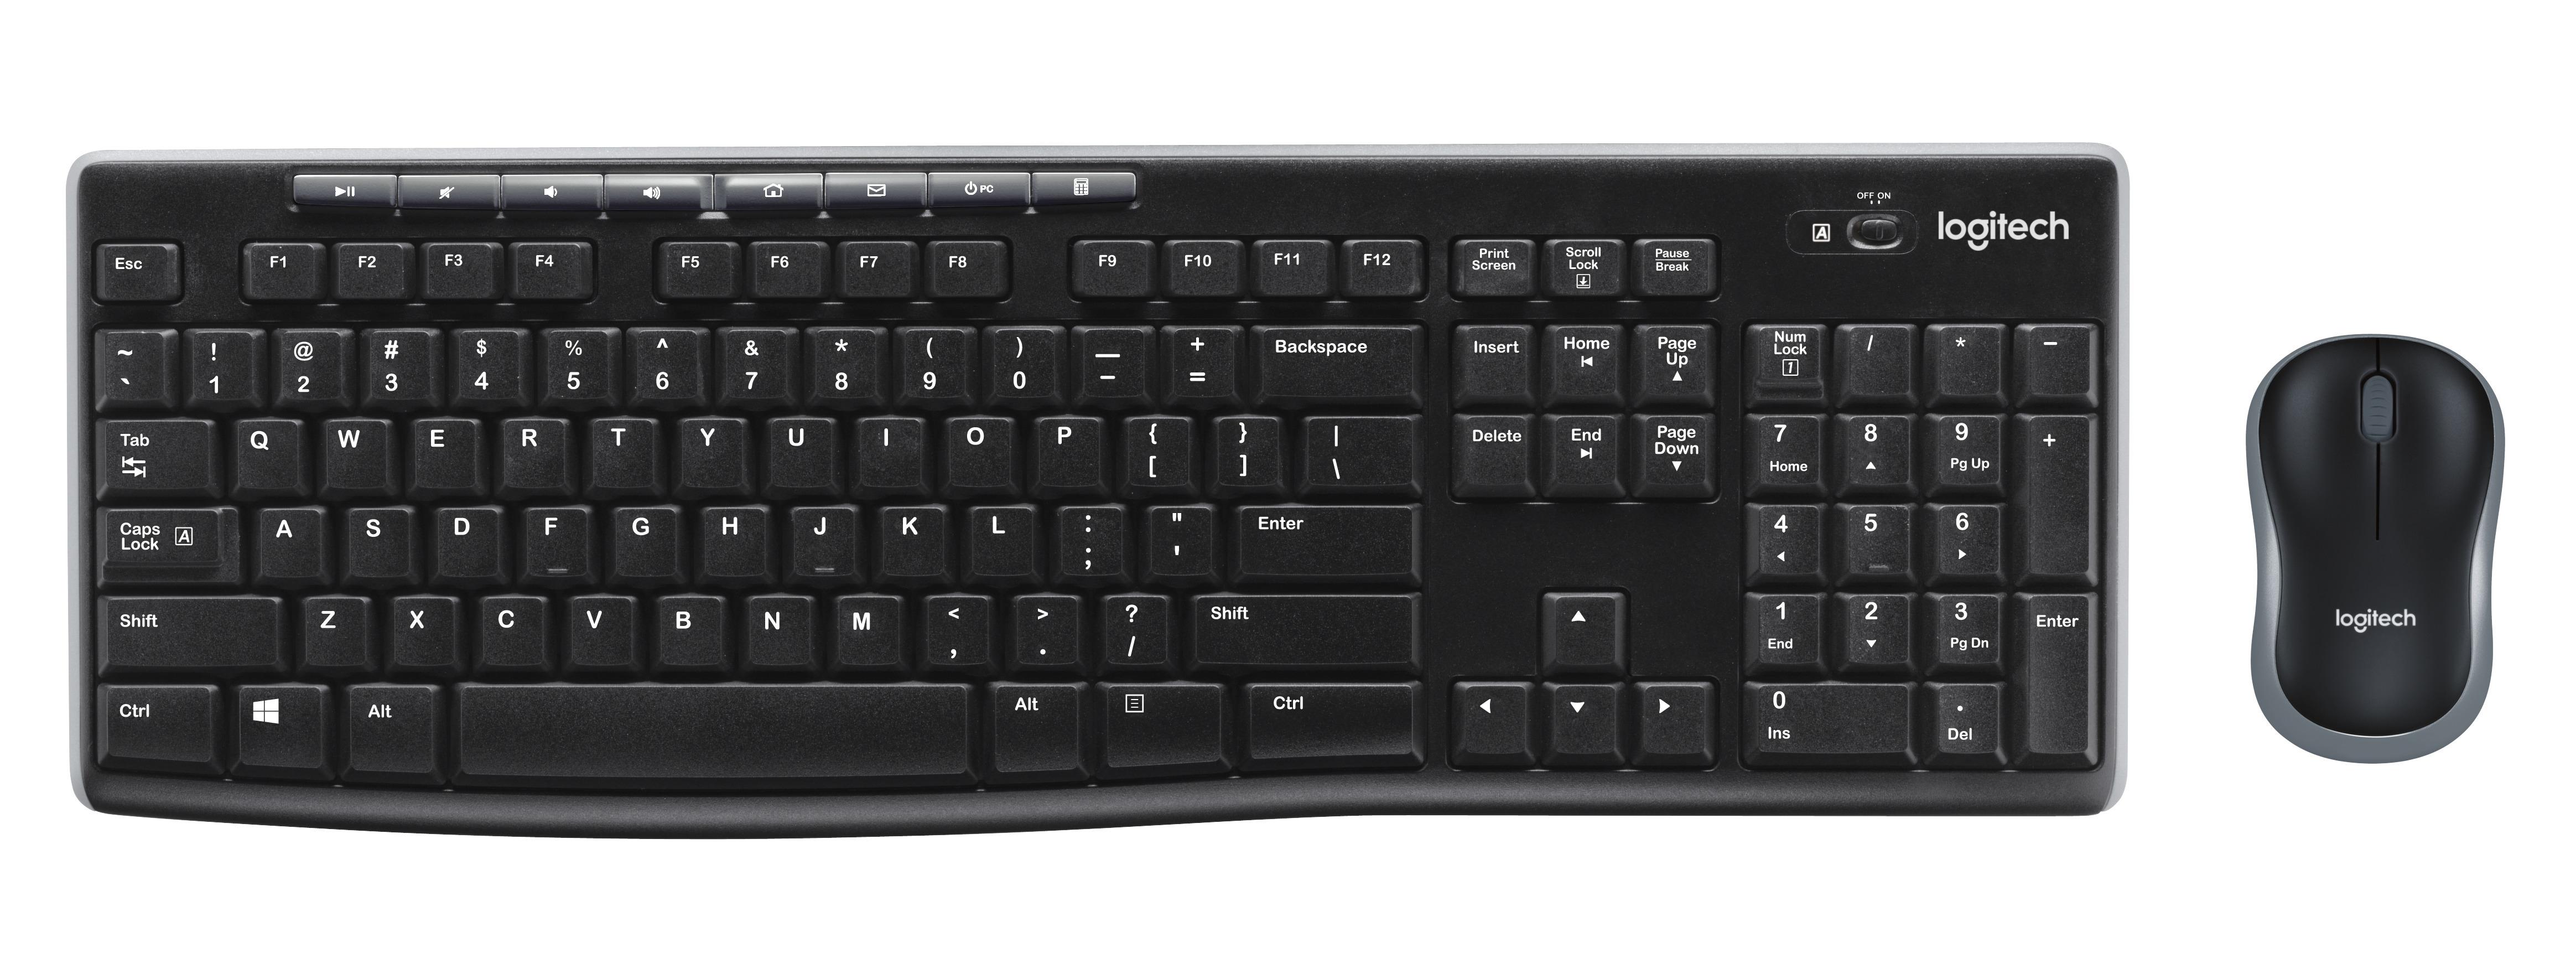 Logitech MK270 - Wireless Combo - Maus / Tastatur